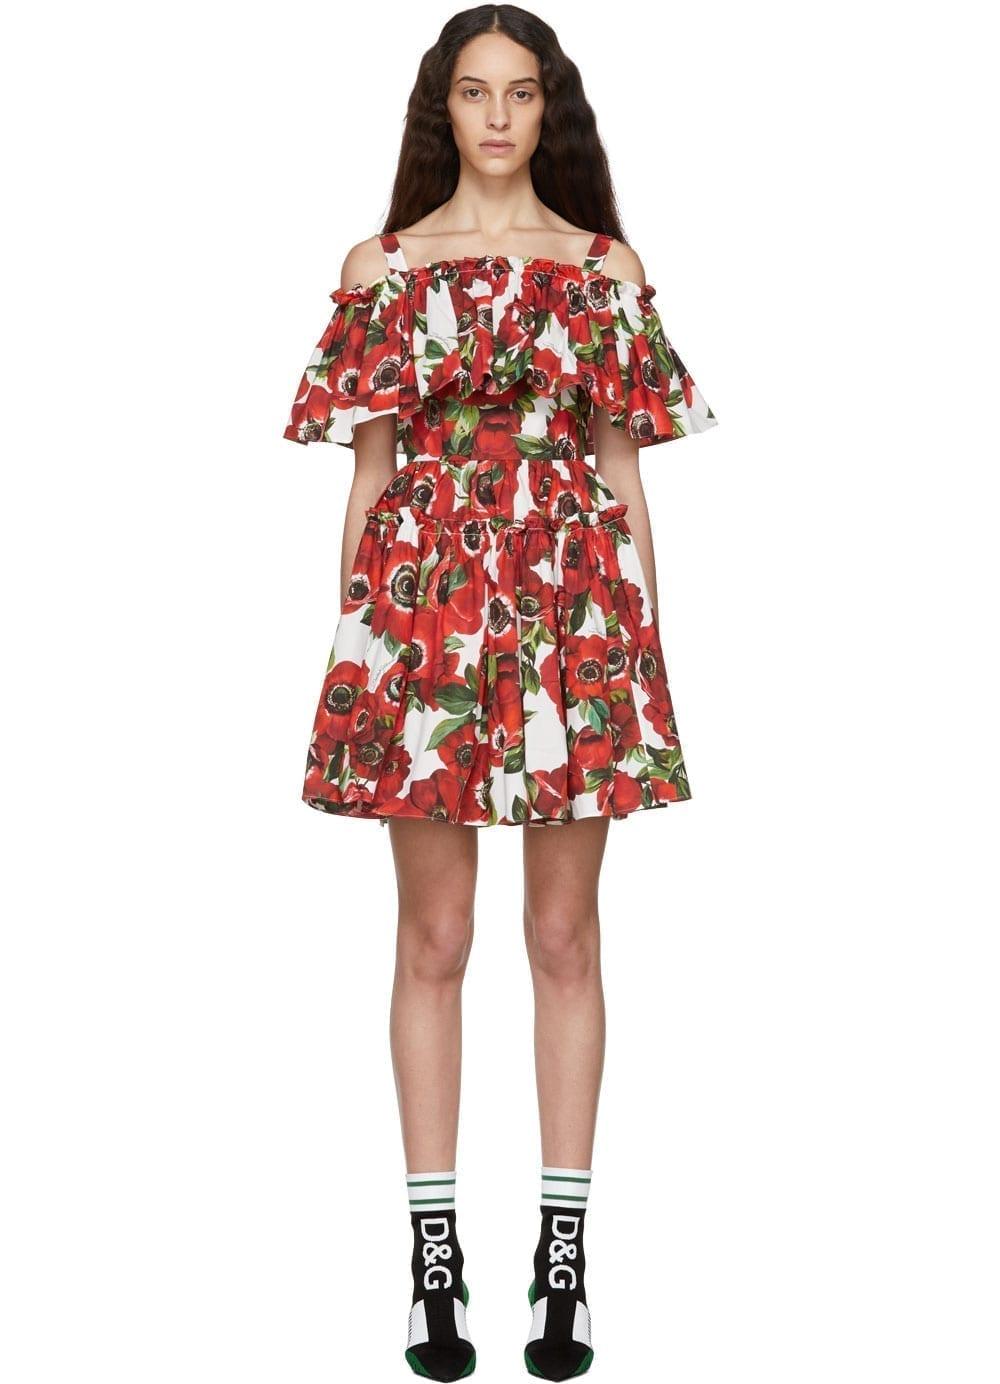 DOLCE & GABBANA Anemone Ruffle Red Dress